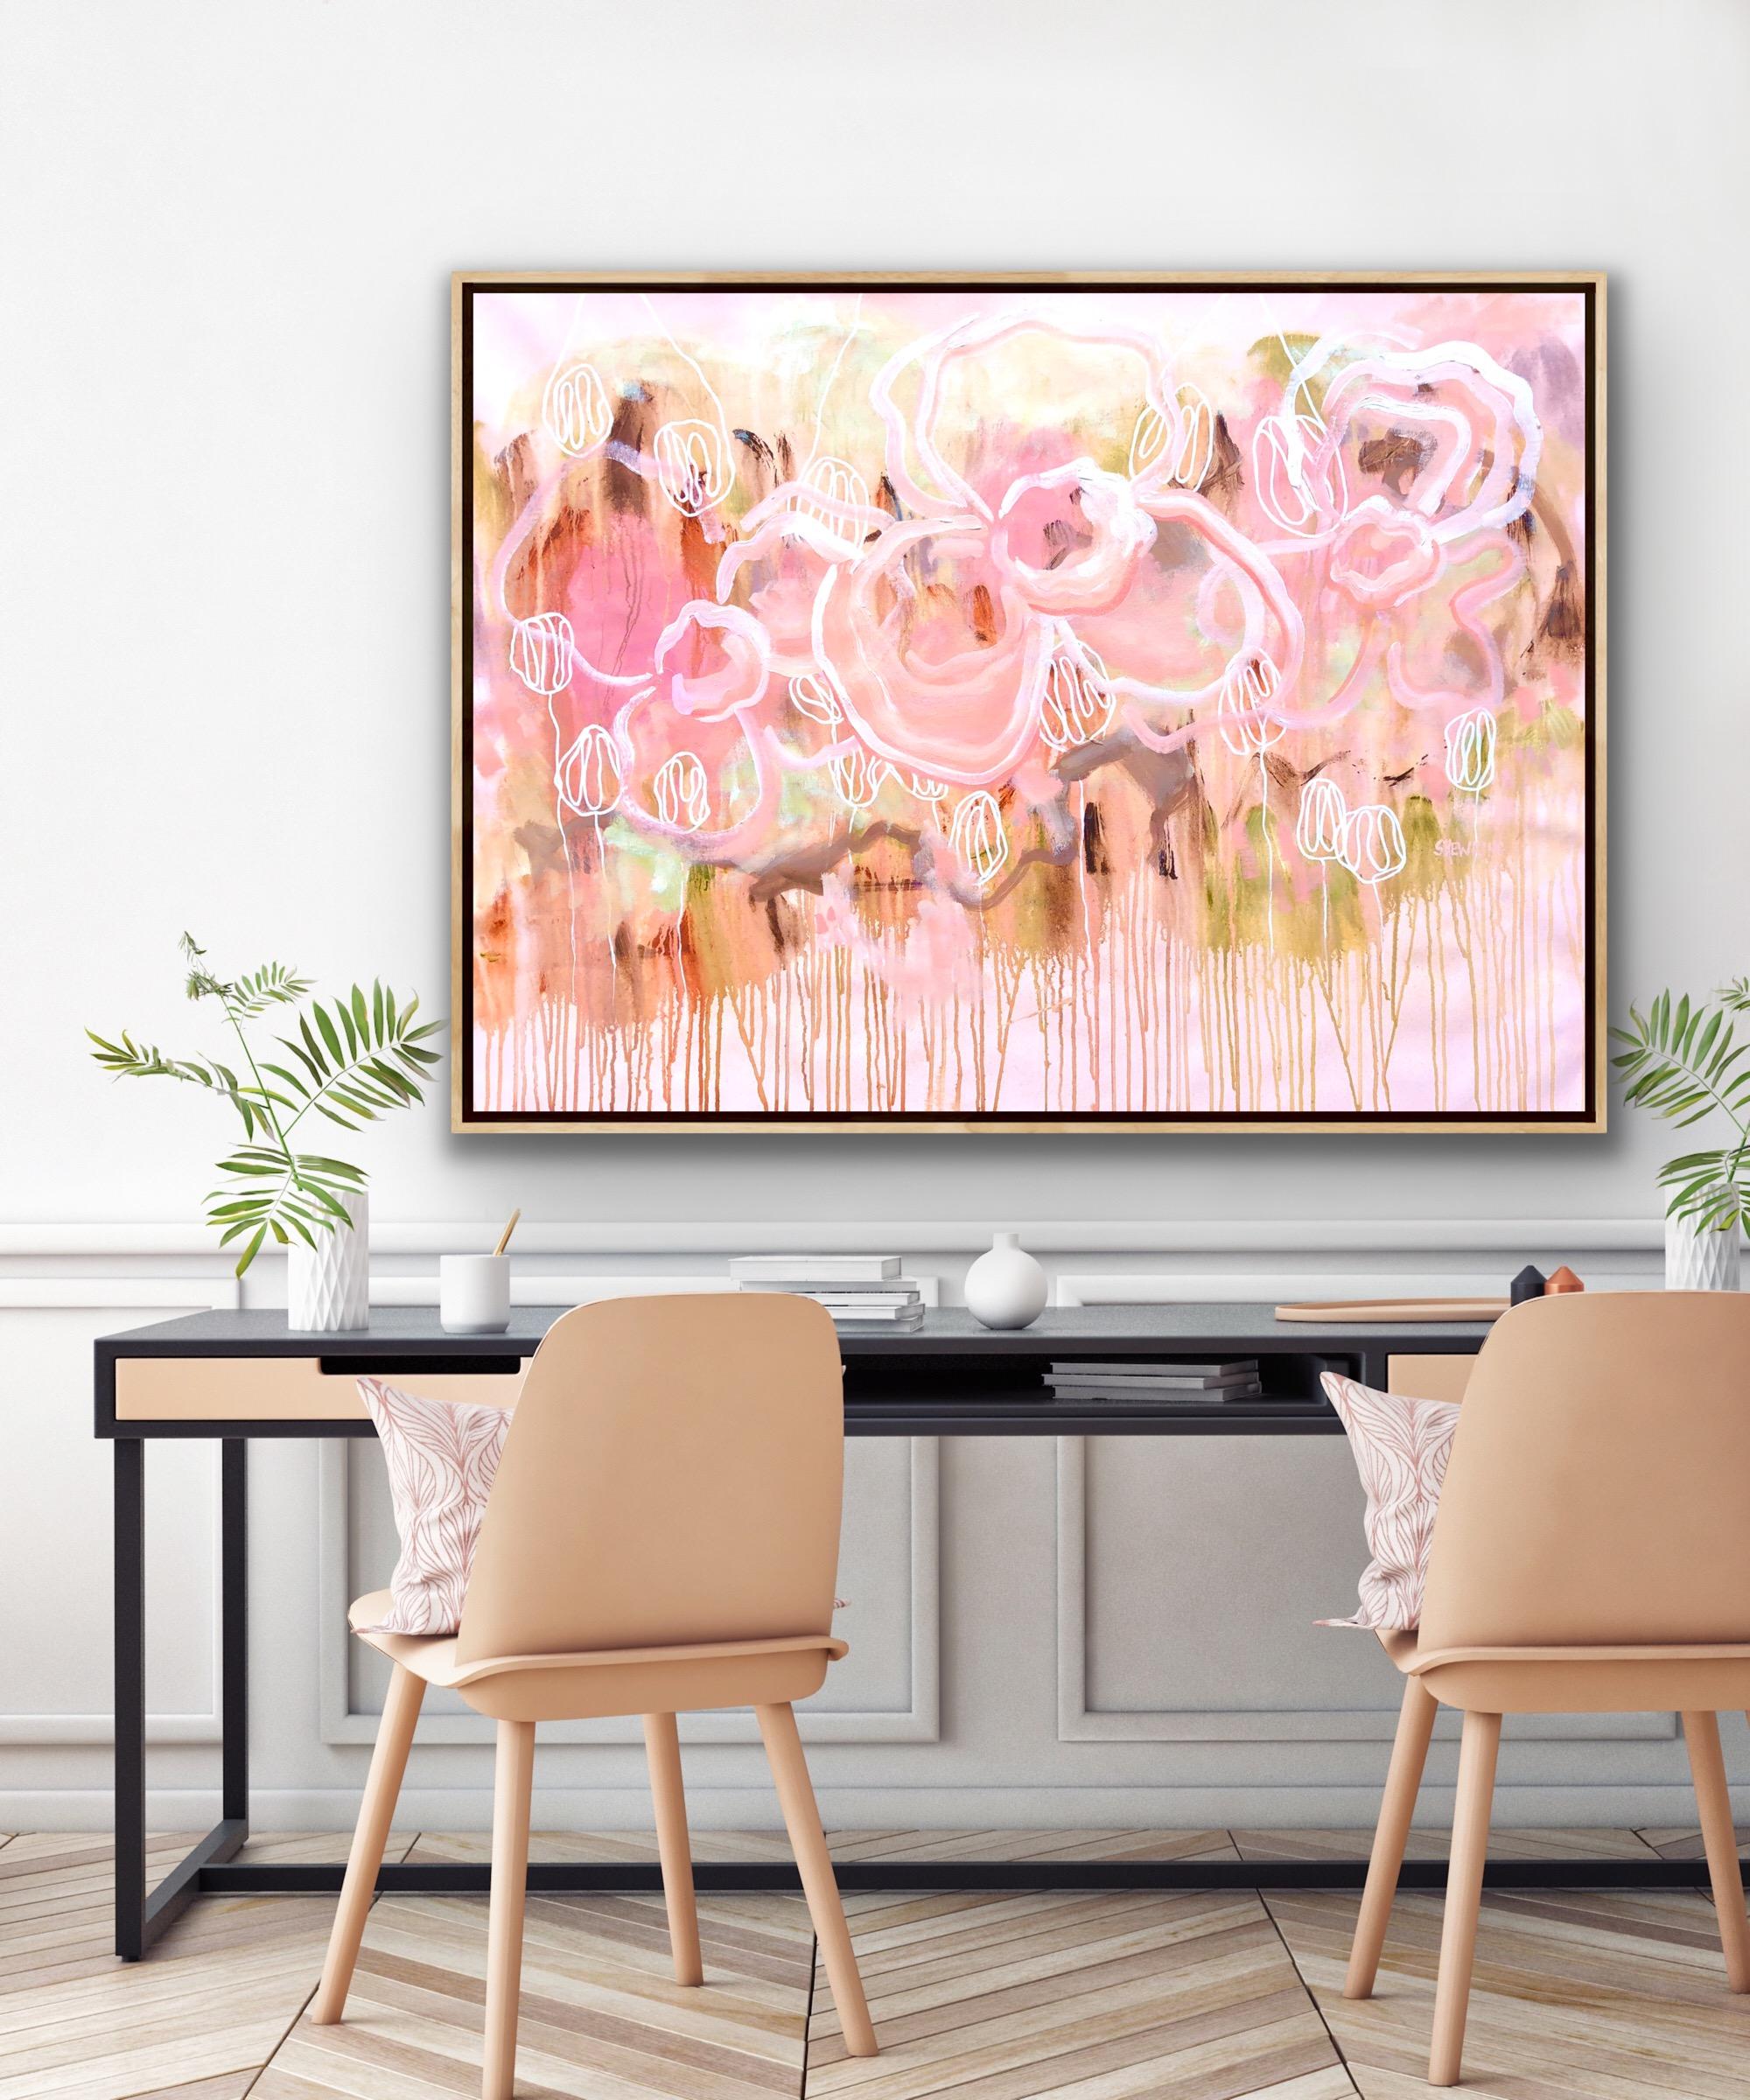 Sweetheart Artrooms